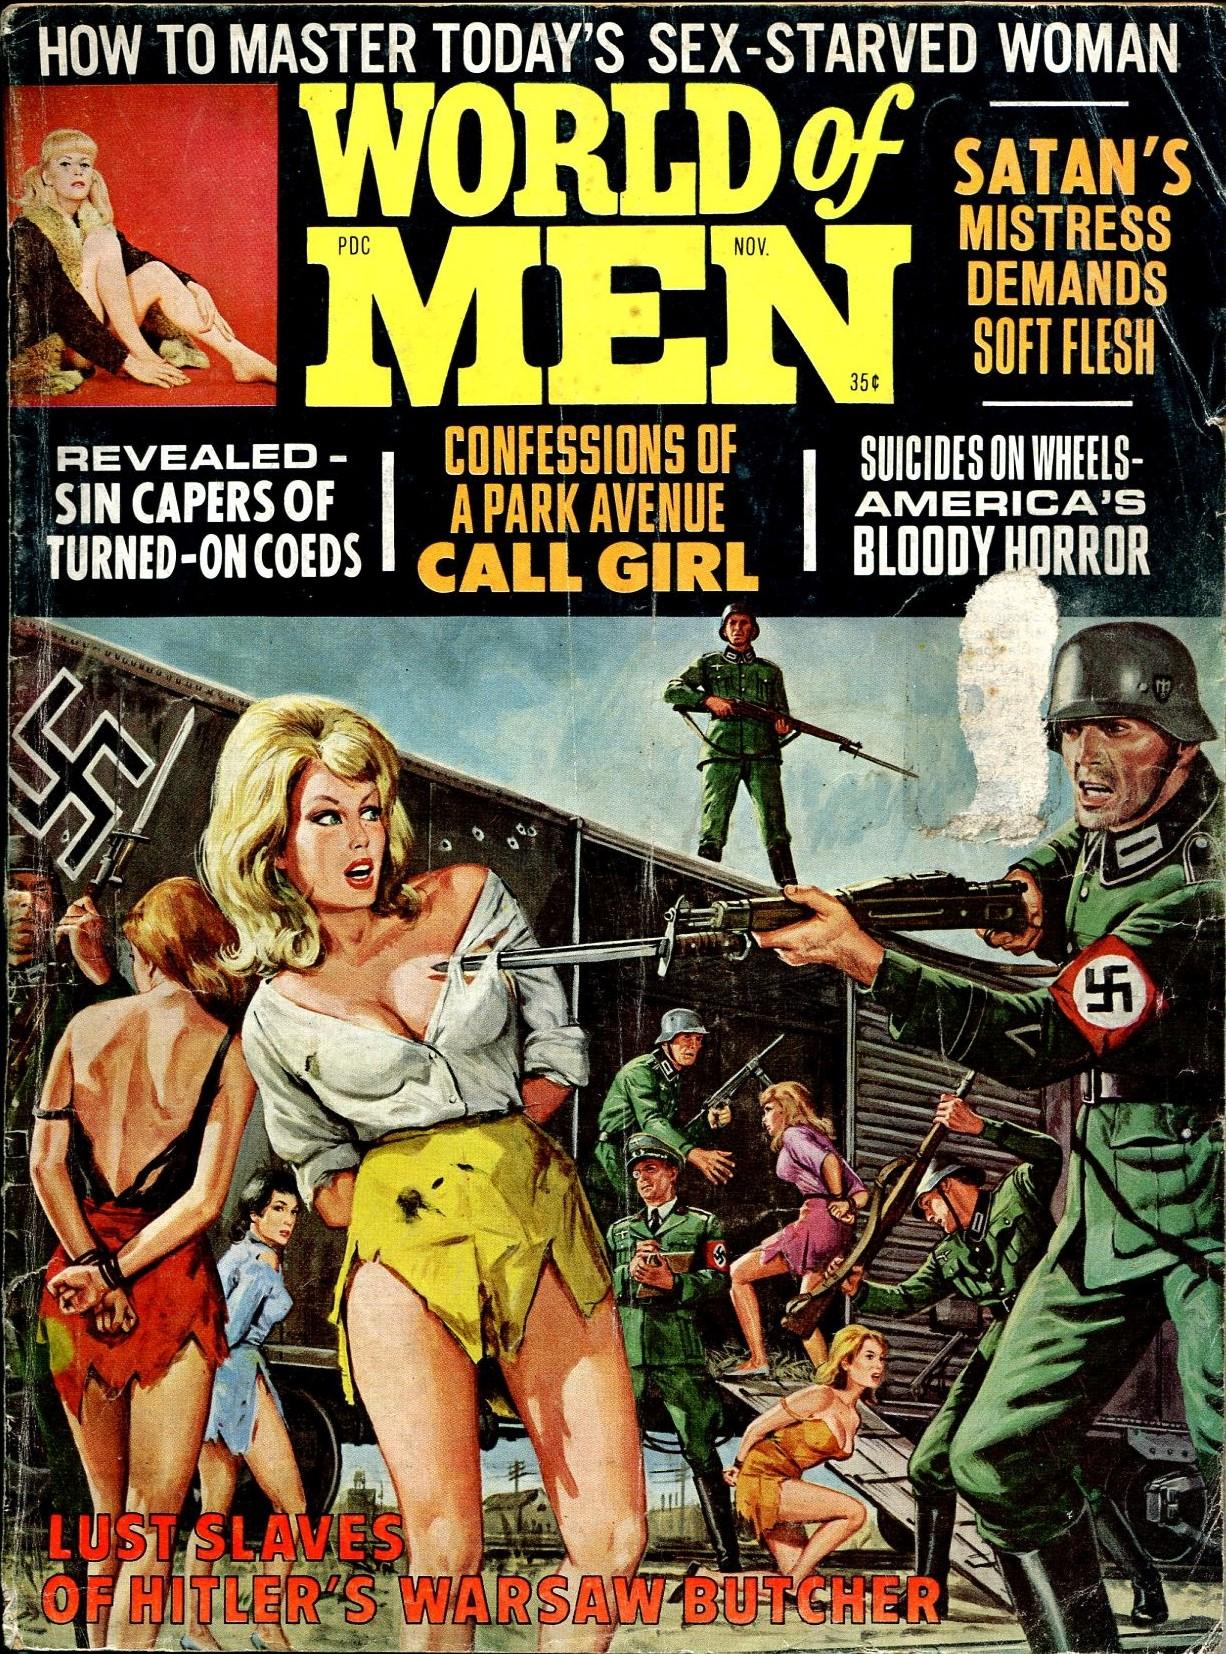 https://pulpcovers.com/wp-content/uploads/2016/04/World-Of-Men-November-1967.jpg